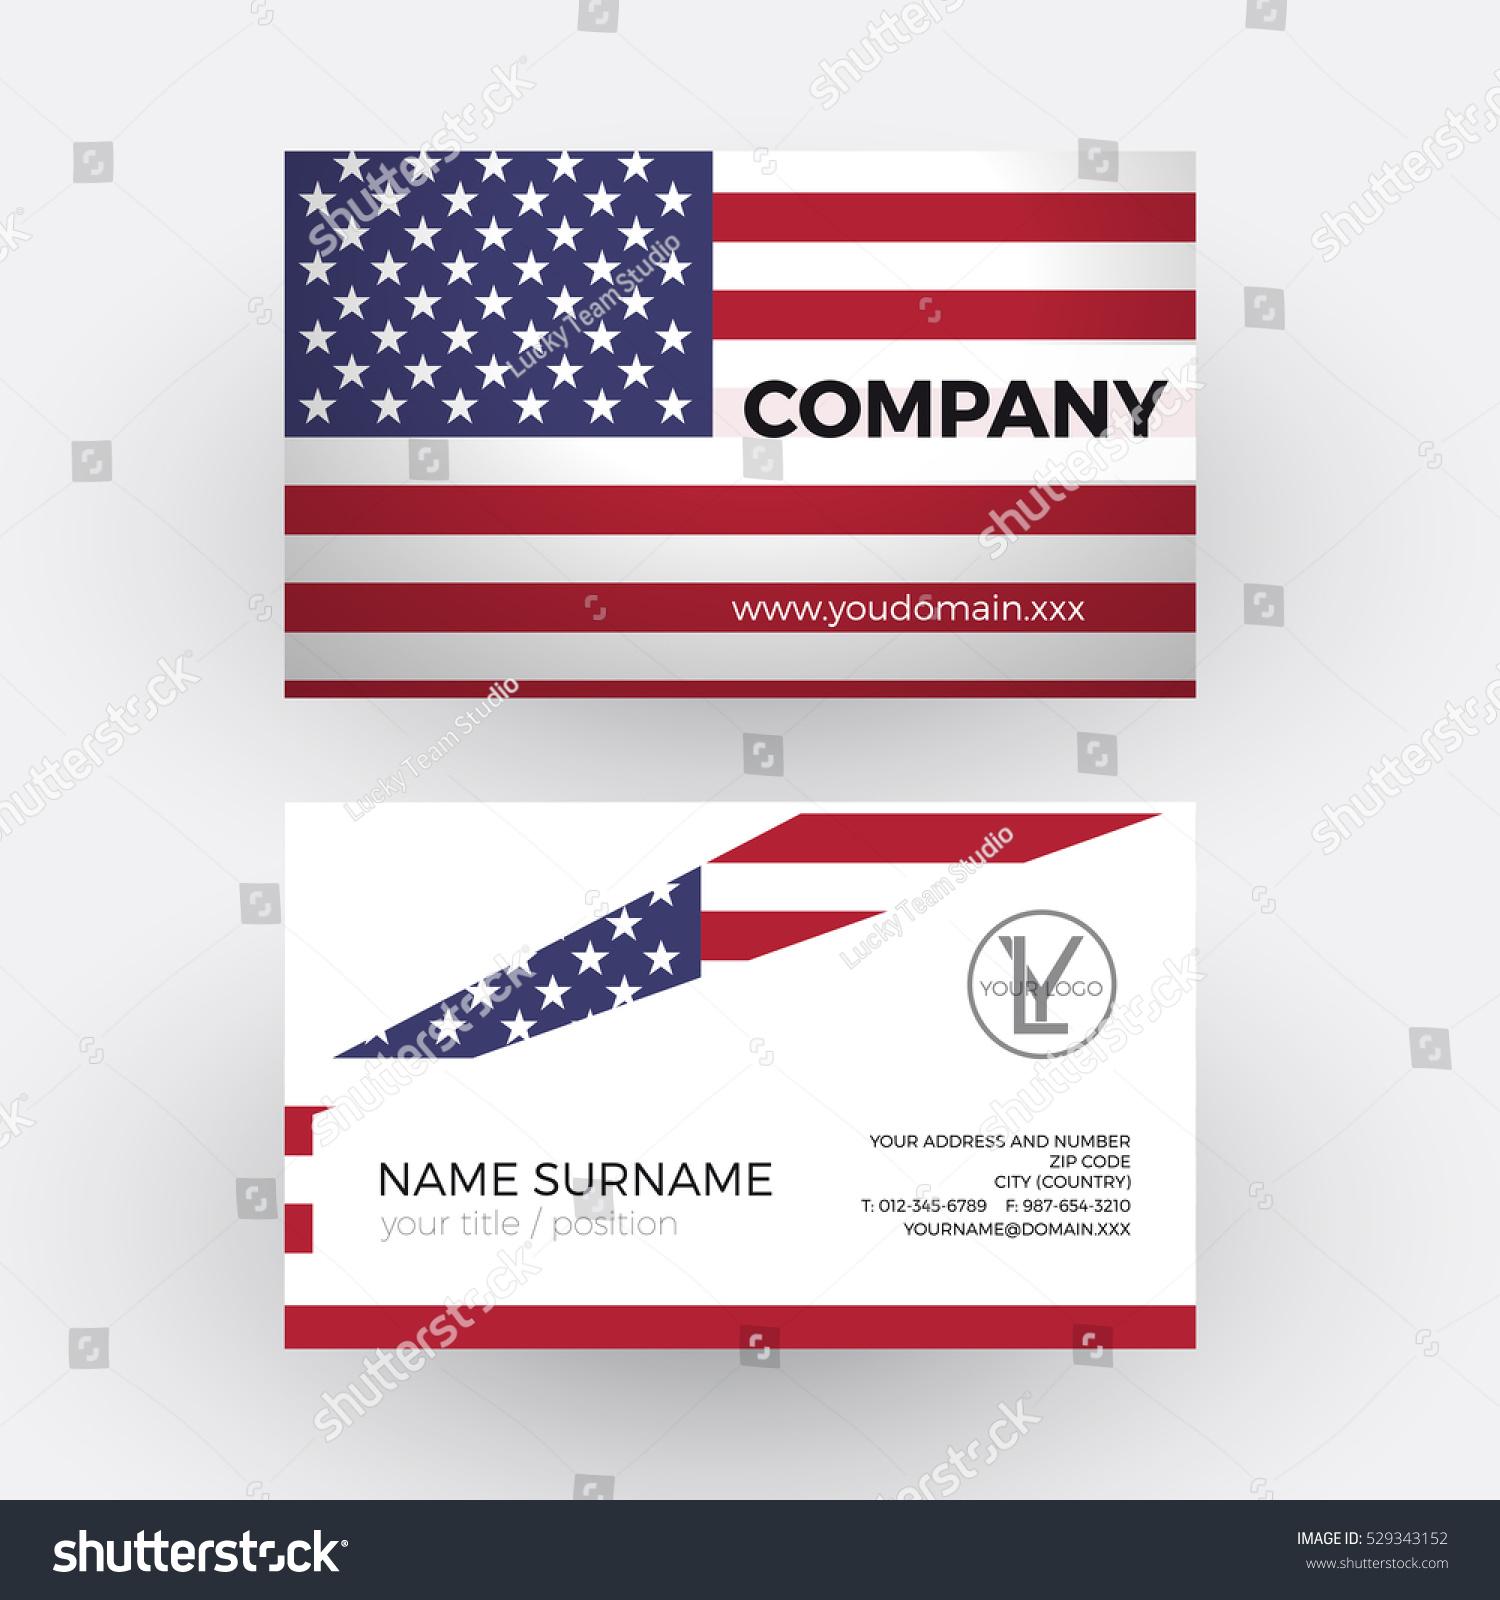 Pretty American Flag Business Cards Photos - Business Card Ideas ...